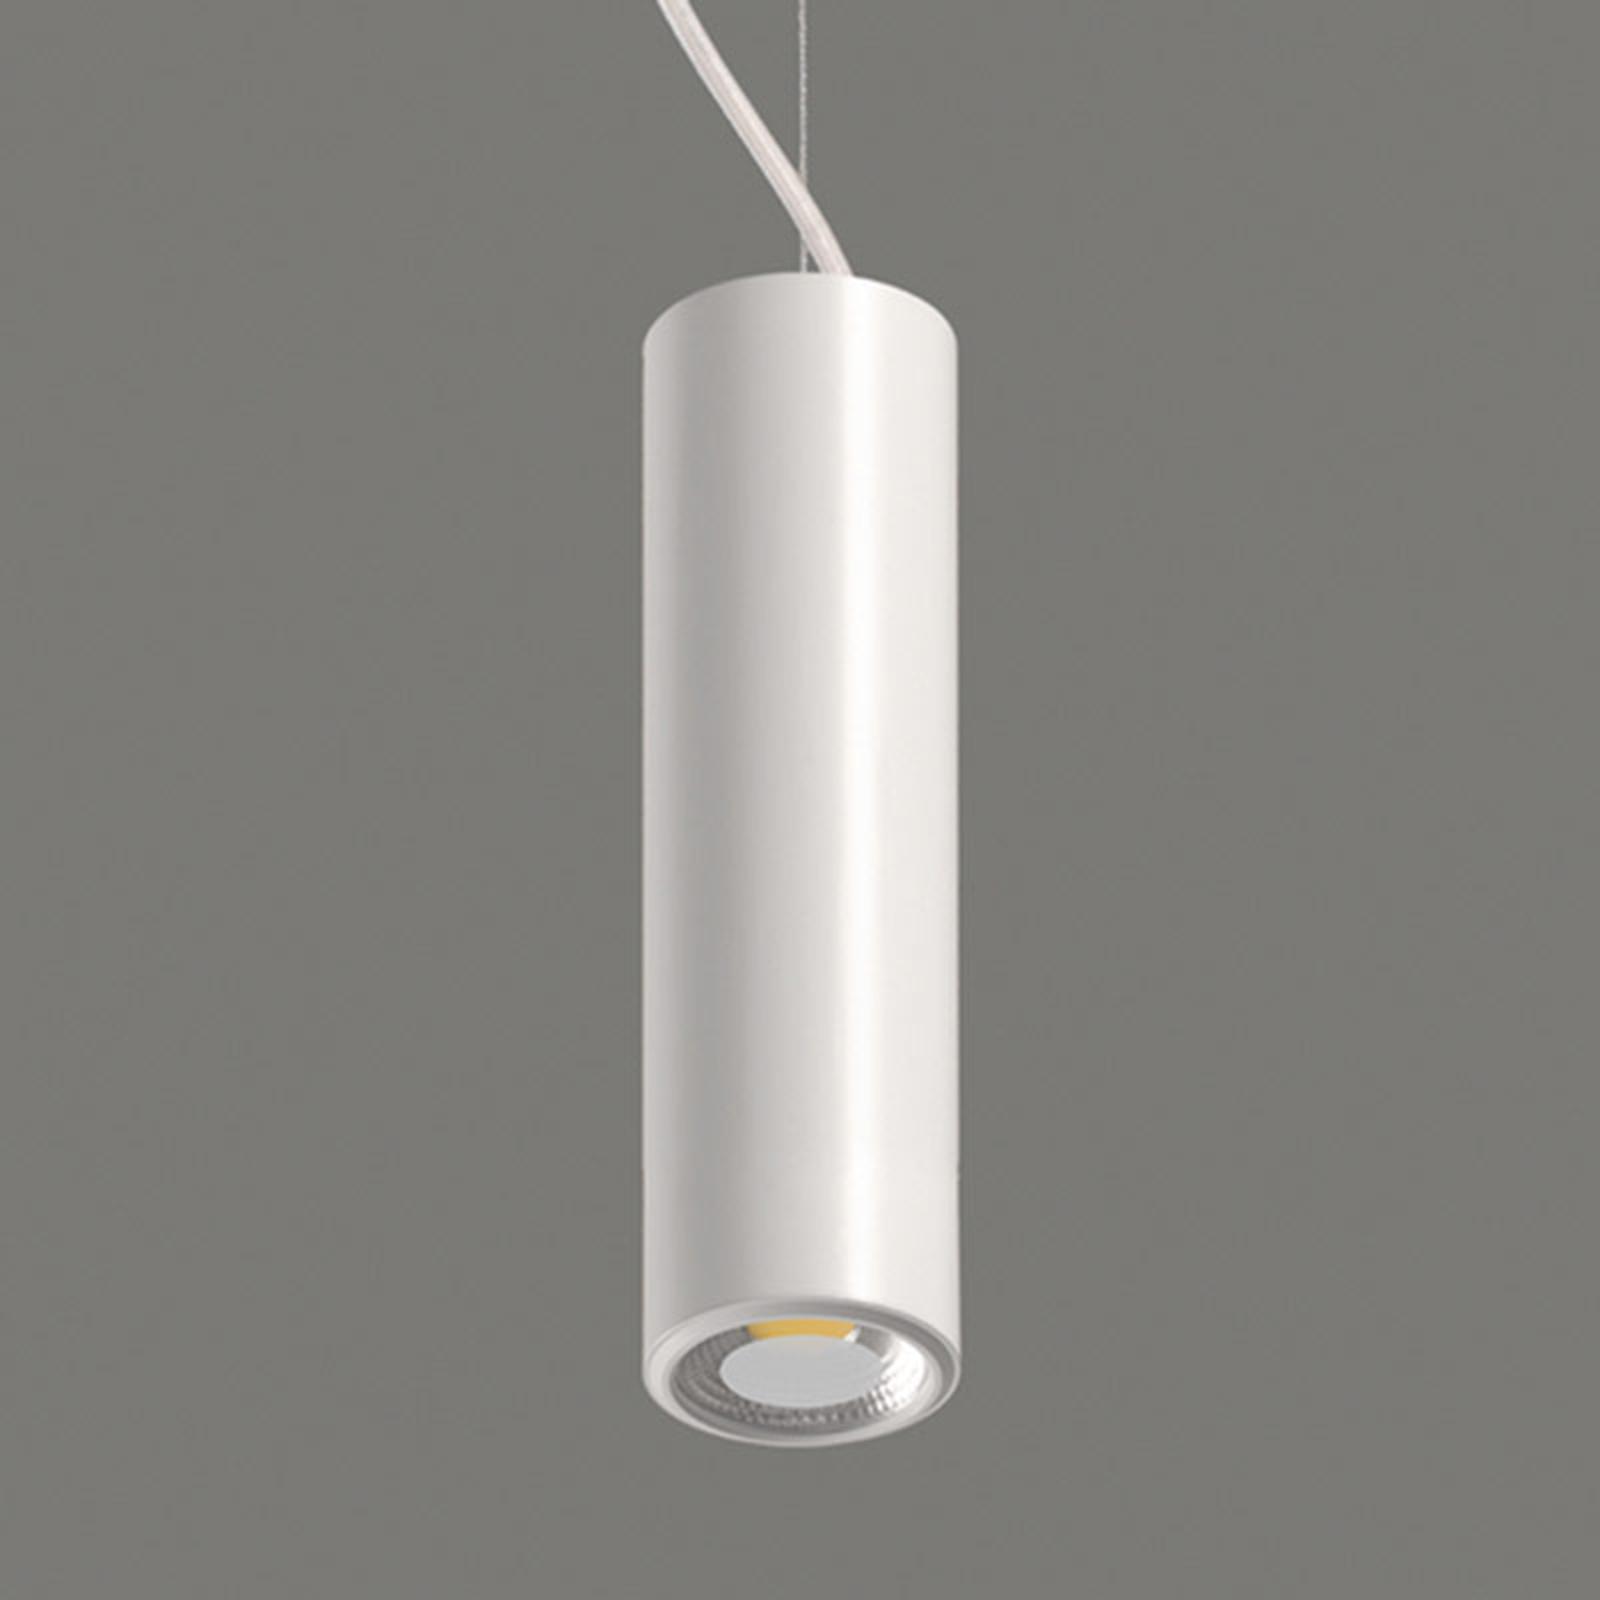 Studio - lampada LED a sospensione bianca